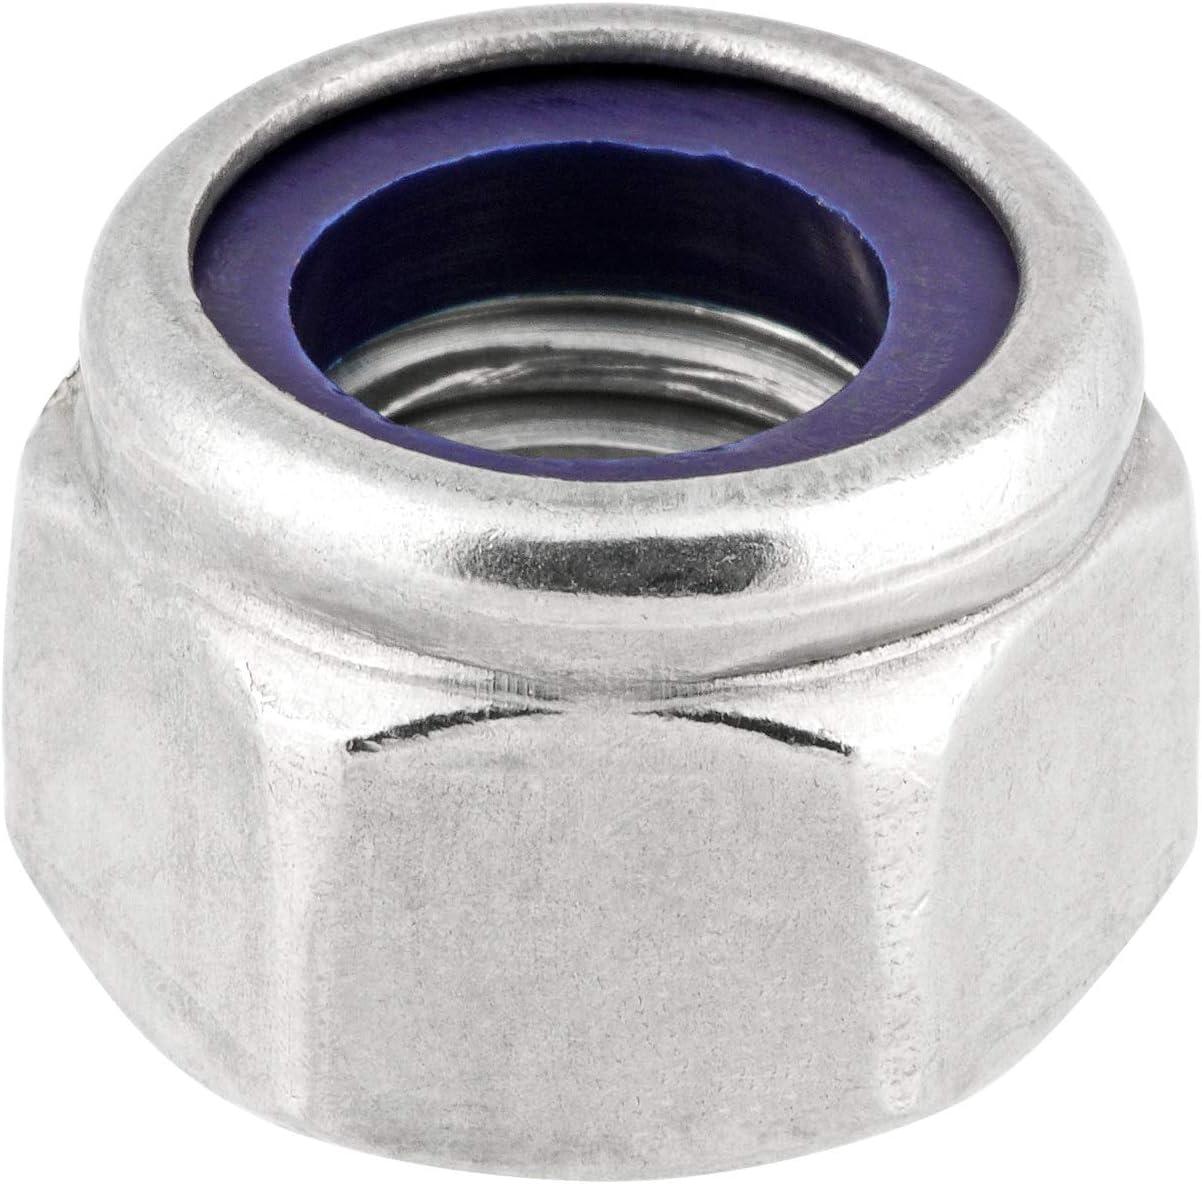 Sicherungsmuttern hohe form M6 DIN 982 ISO 7040 Edelstahlmuttern Stopmuttern Klemmmuttern selbstsichernde Sechskantmuttern M6 10 St/ück